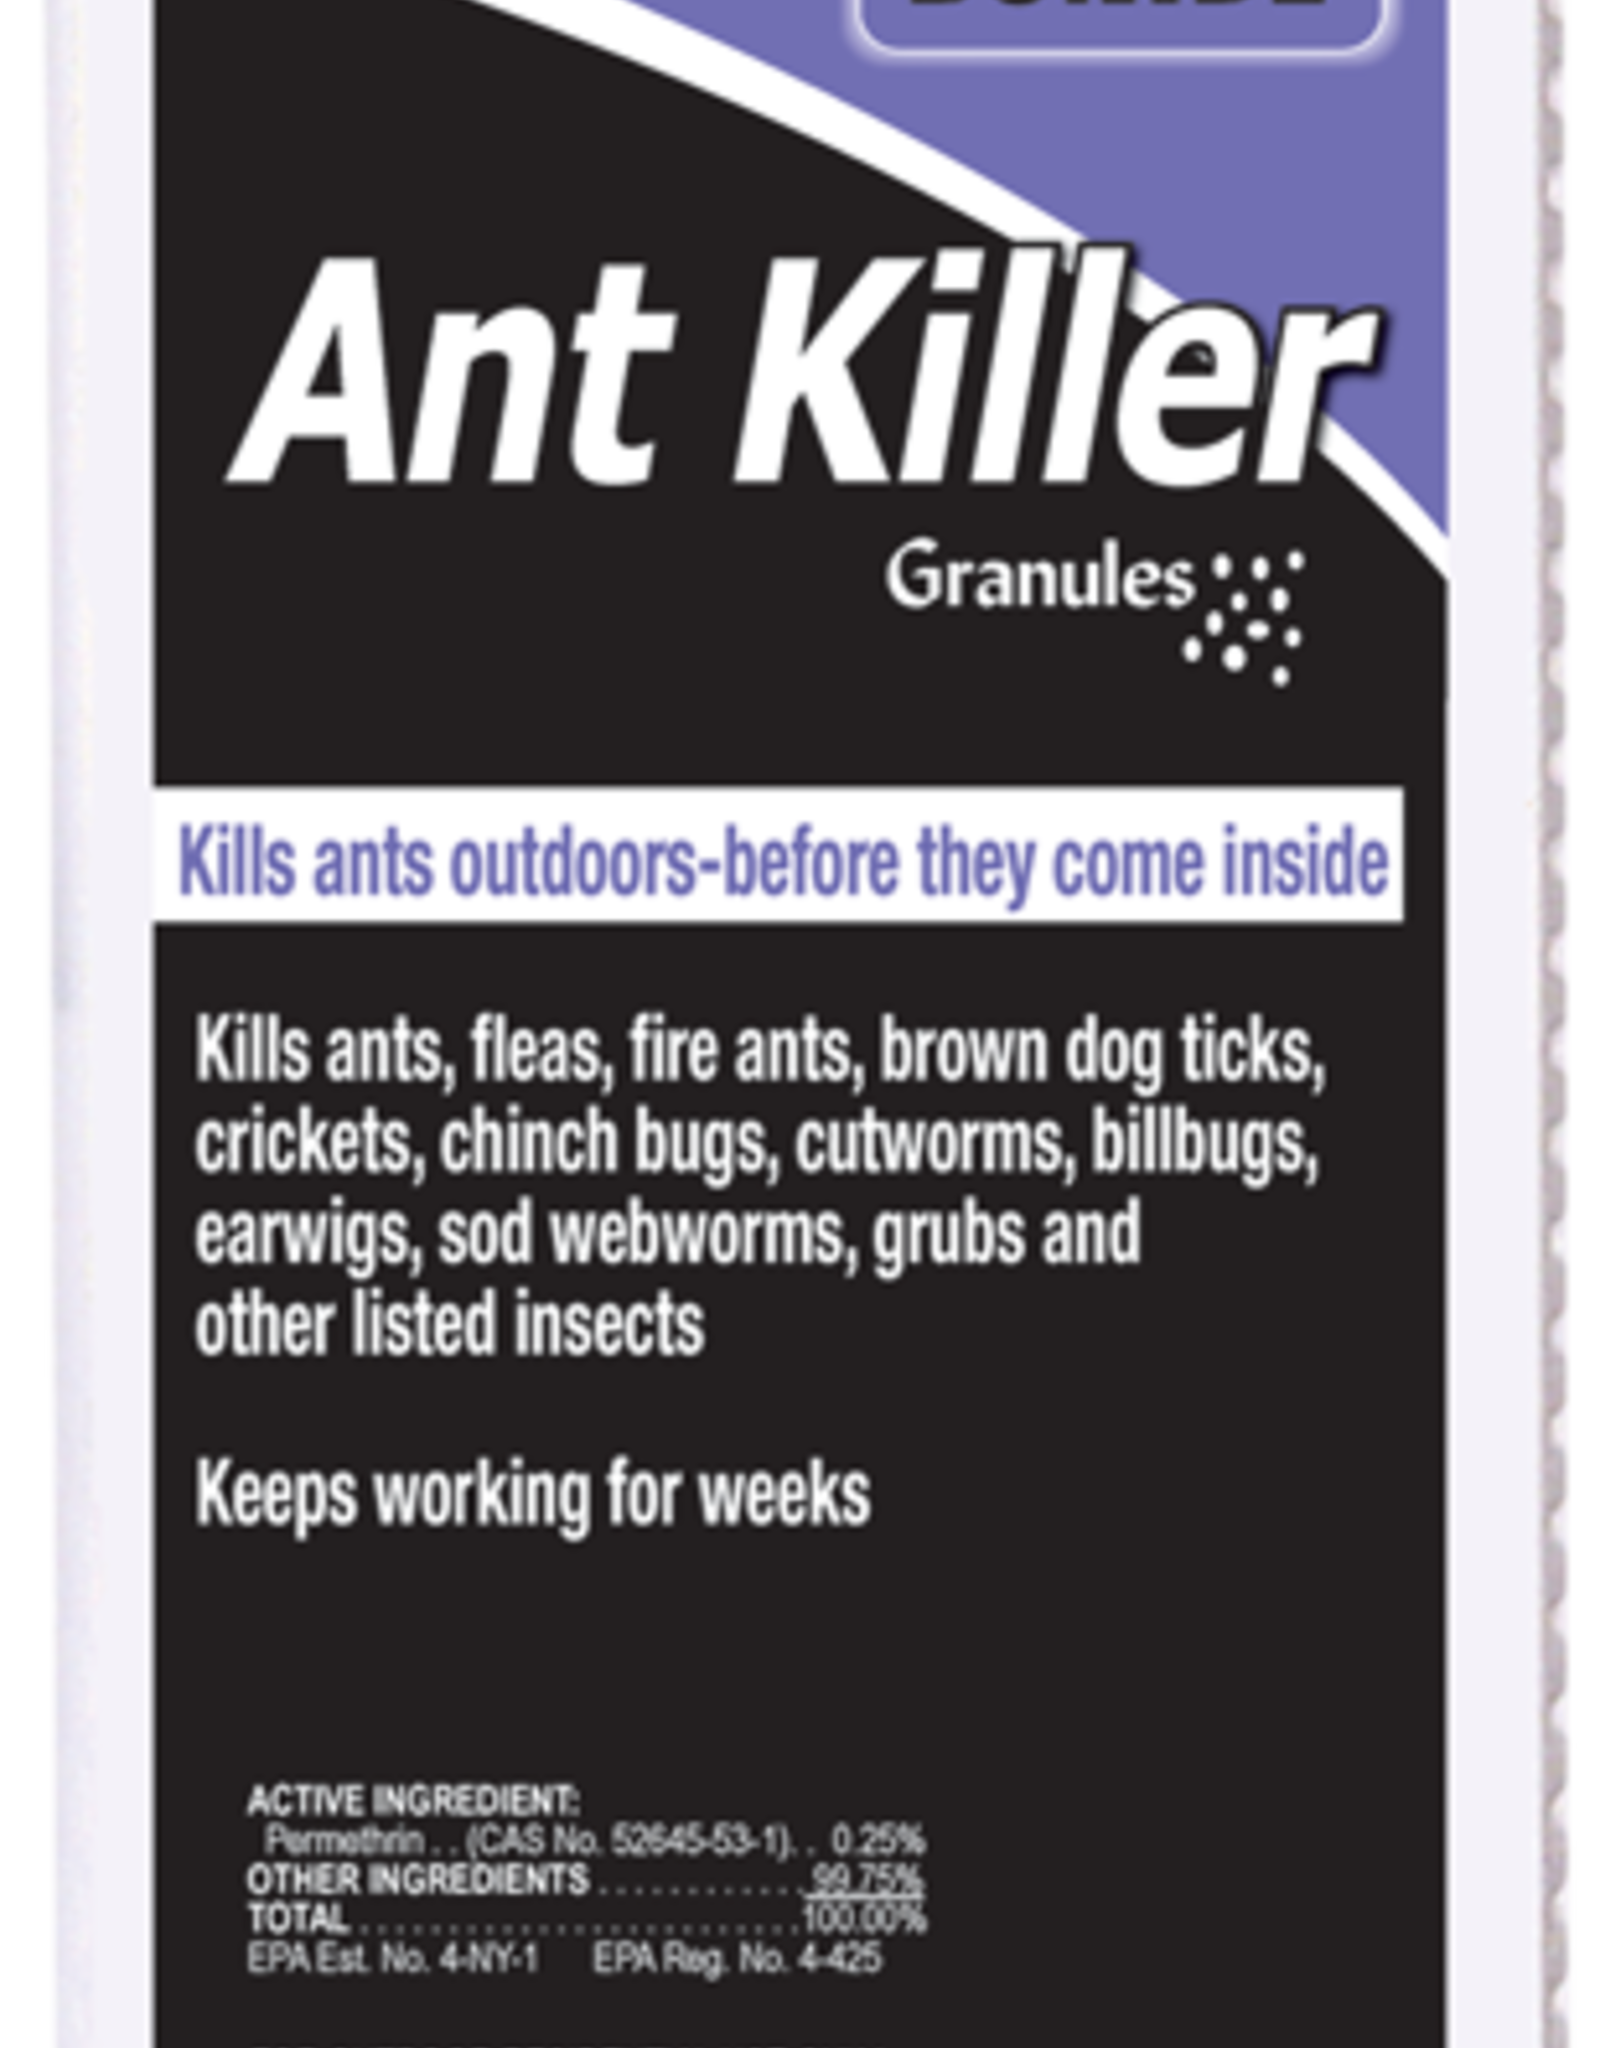 BONIDE PRODUCTS INC     P BONIDE ANT KILLER GRANULES 1LB